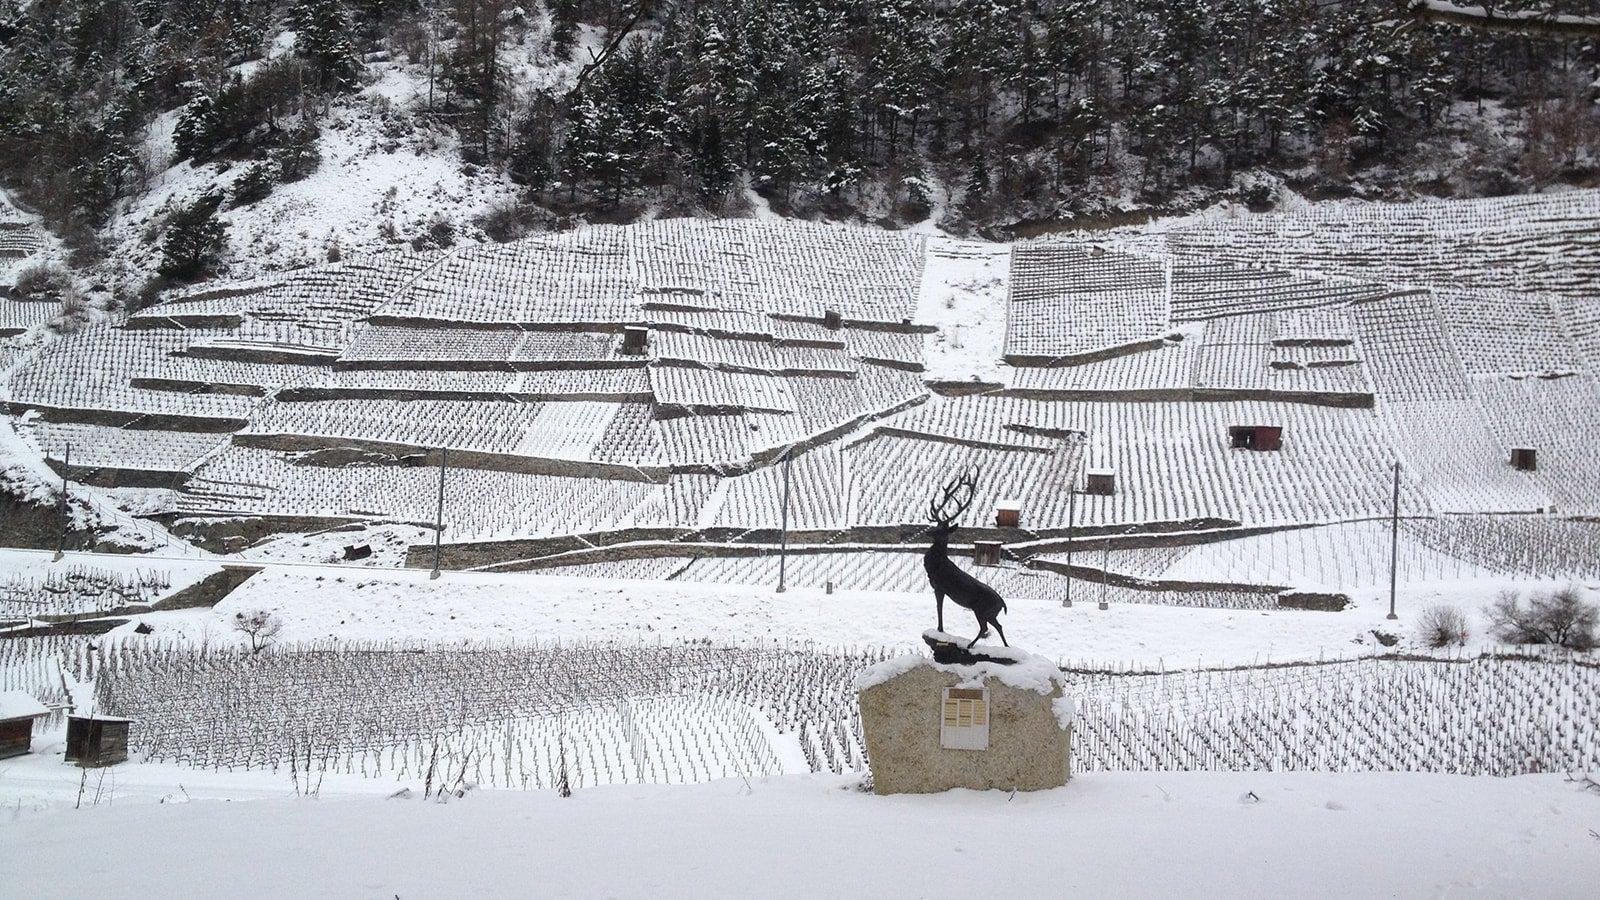 Rhône Valley in the snow